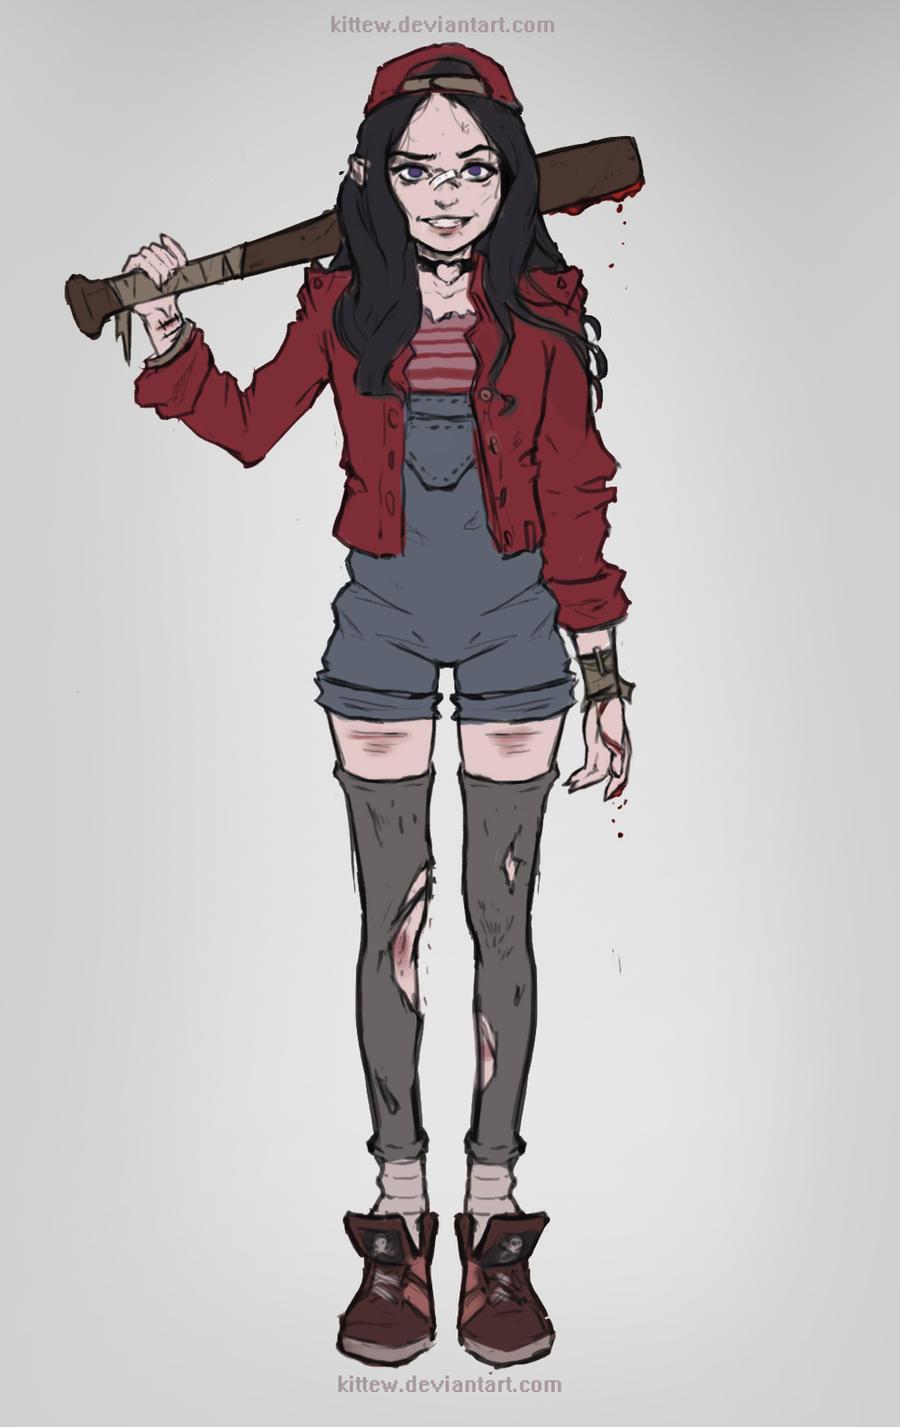 Character Design Oc : Oc character sketch by kittew on deviantart